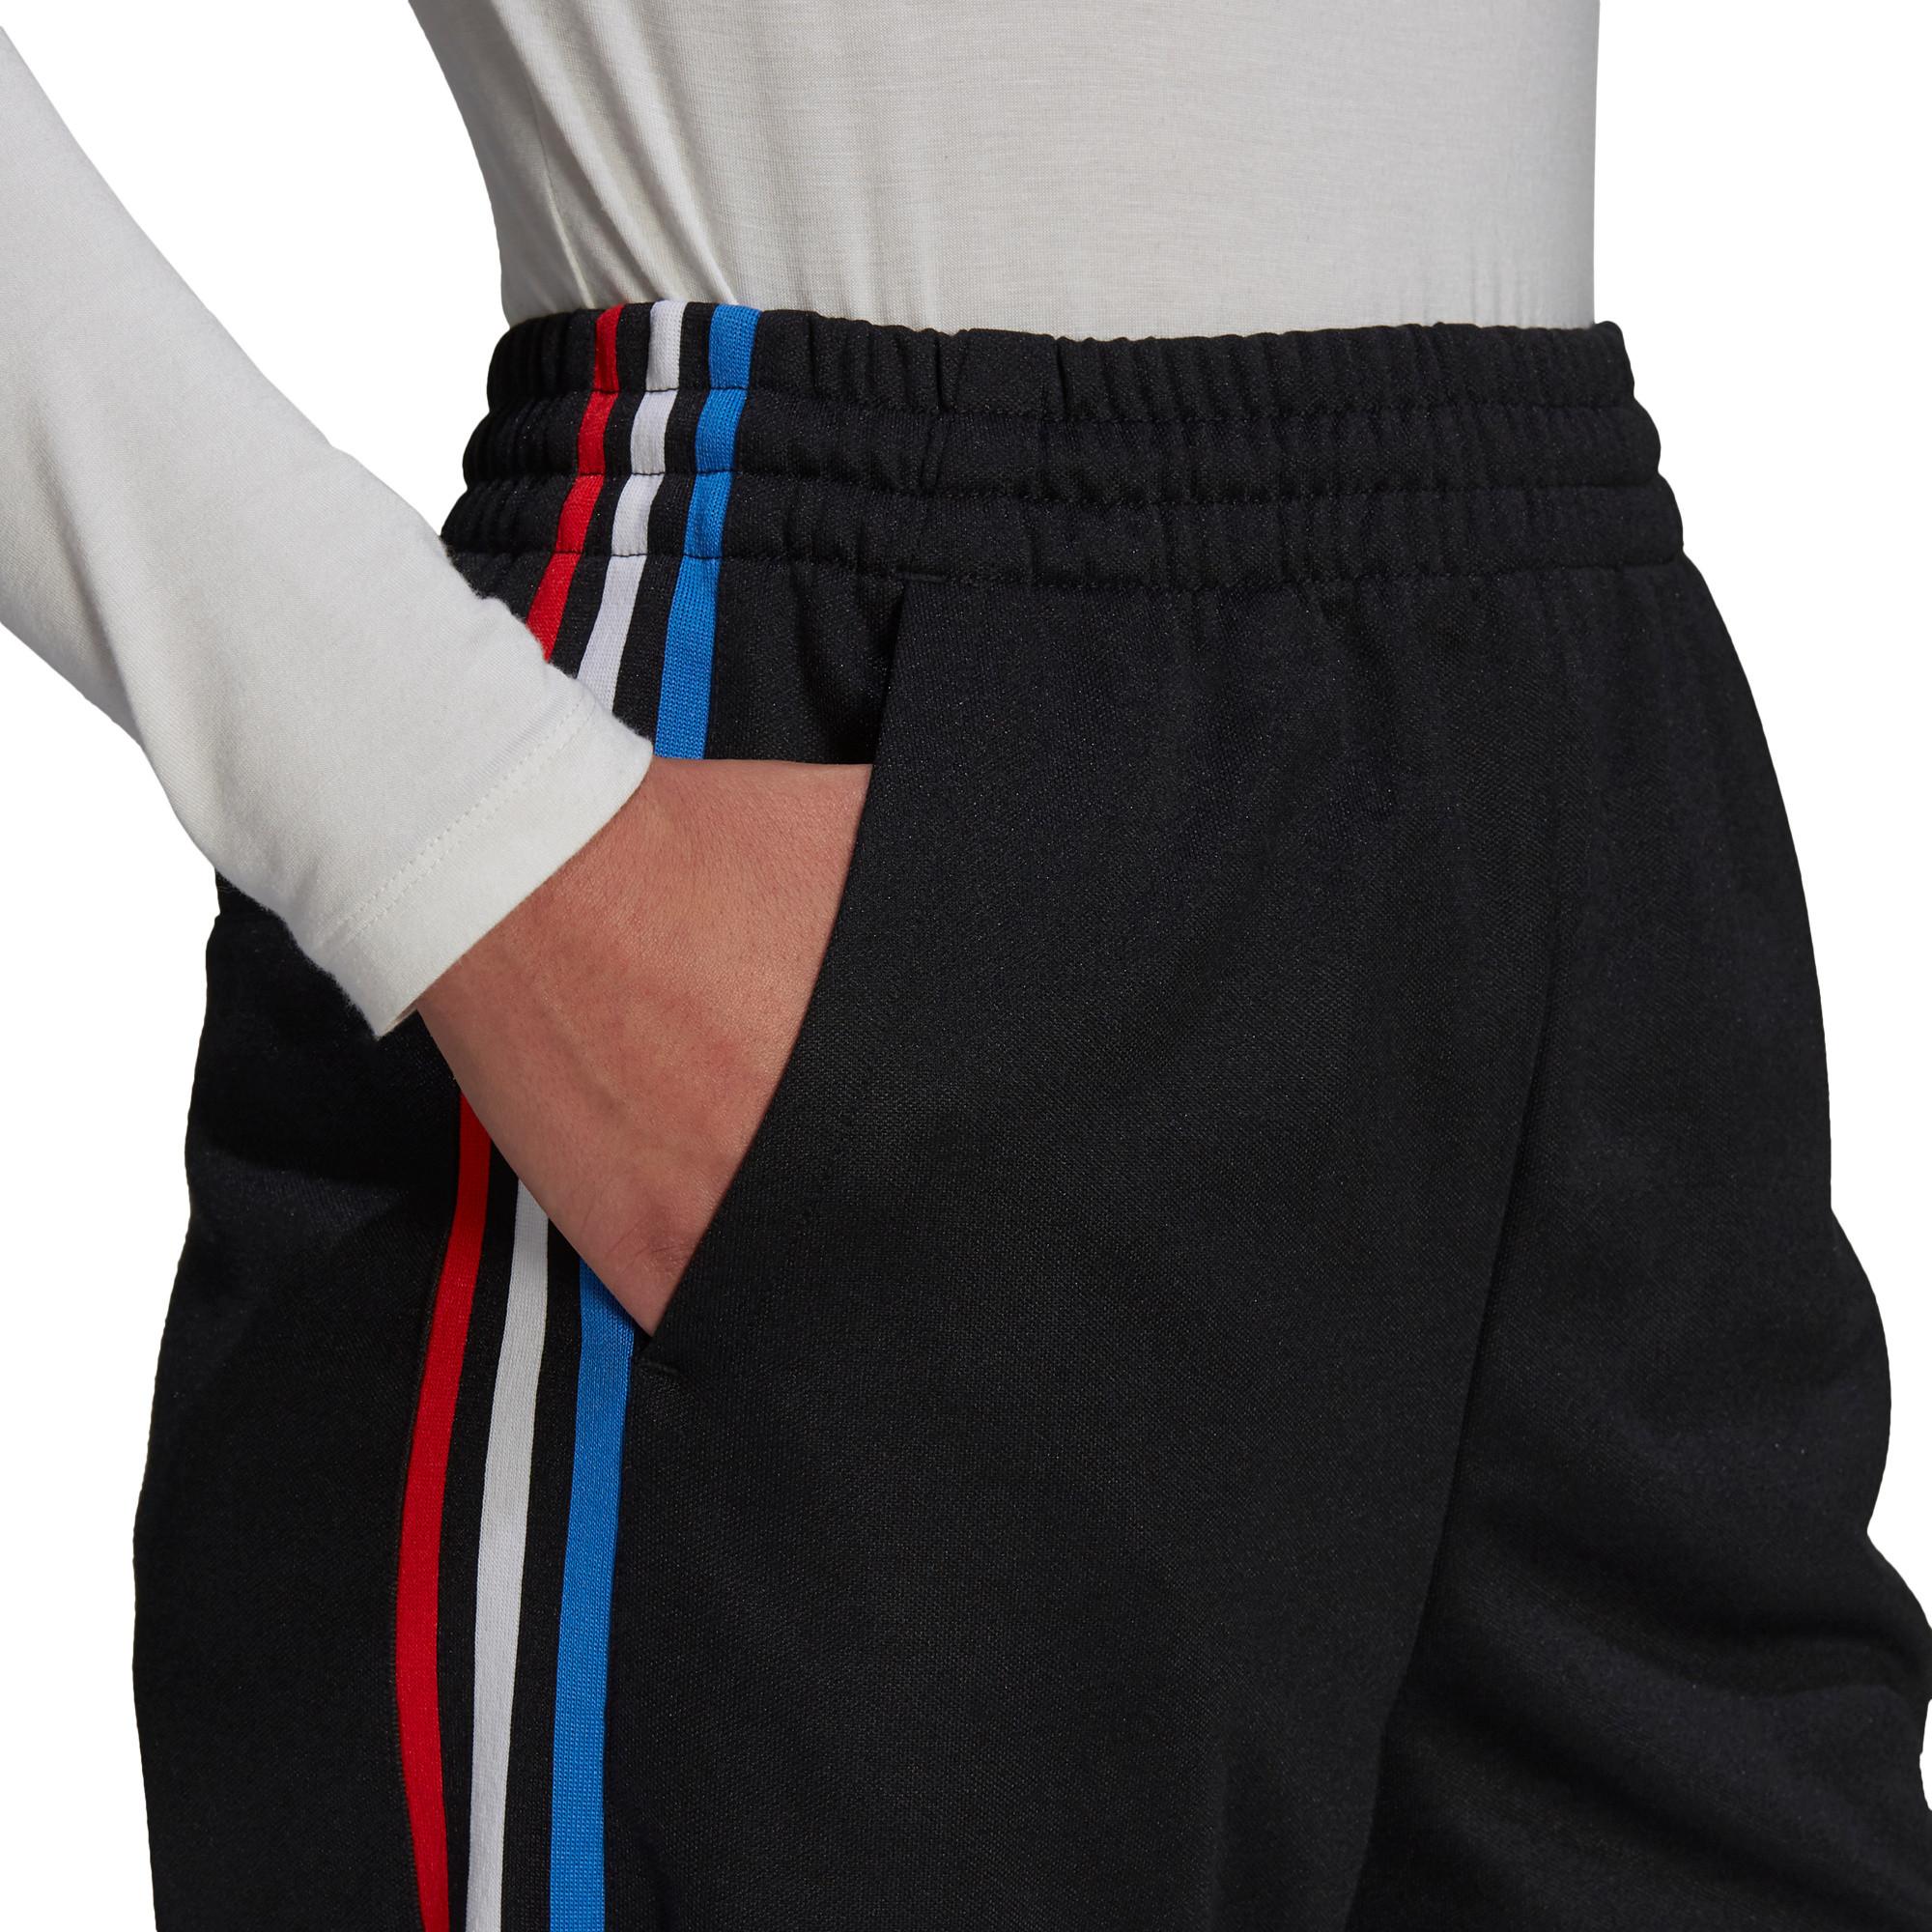 Pantaloni tuta adicolor Tricolor Primeblue, Nero, large image number 5